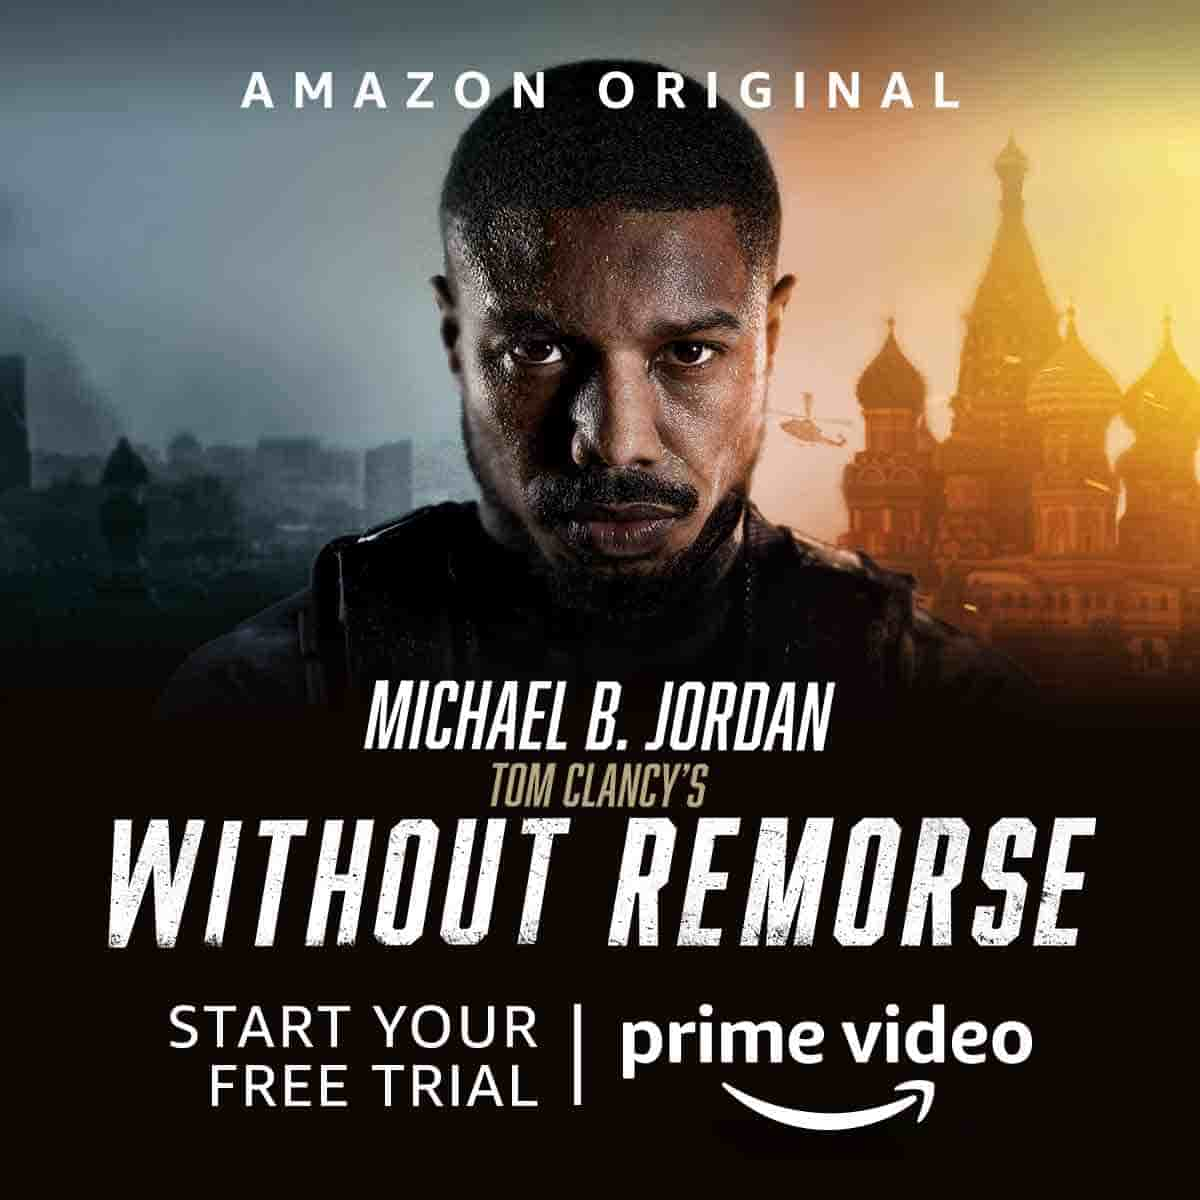 Amazon Original: Without Remorse launch